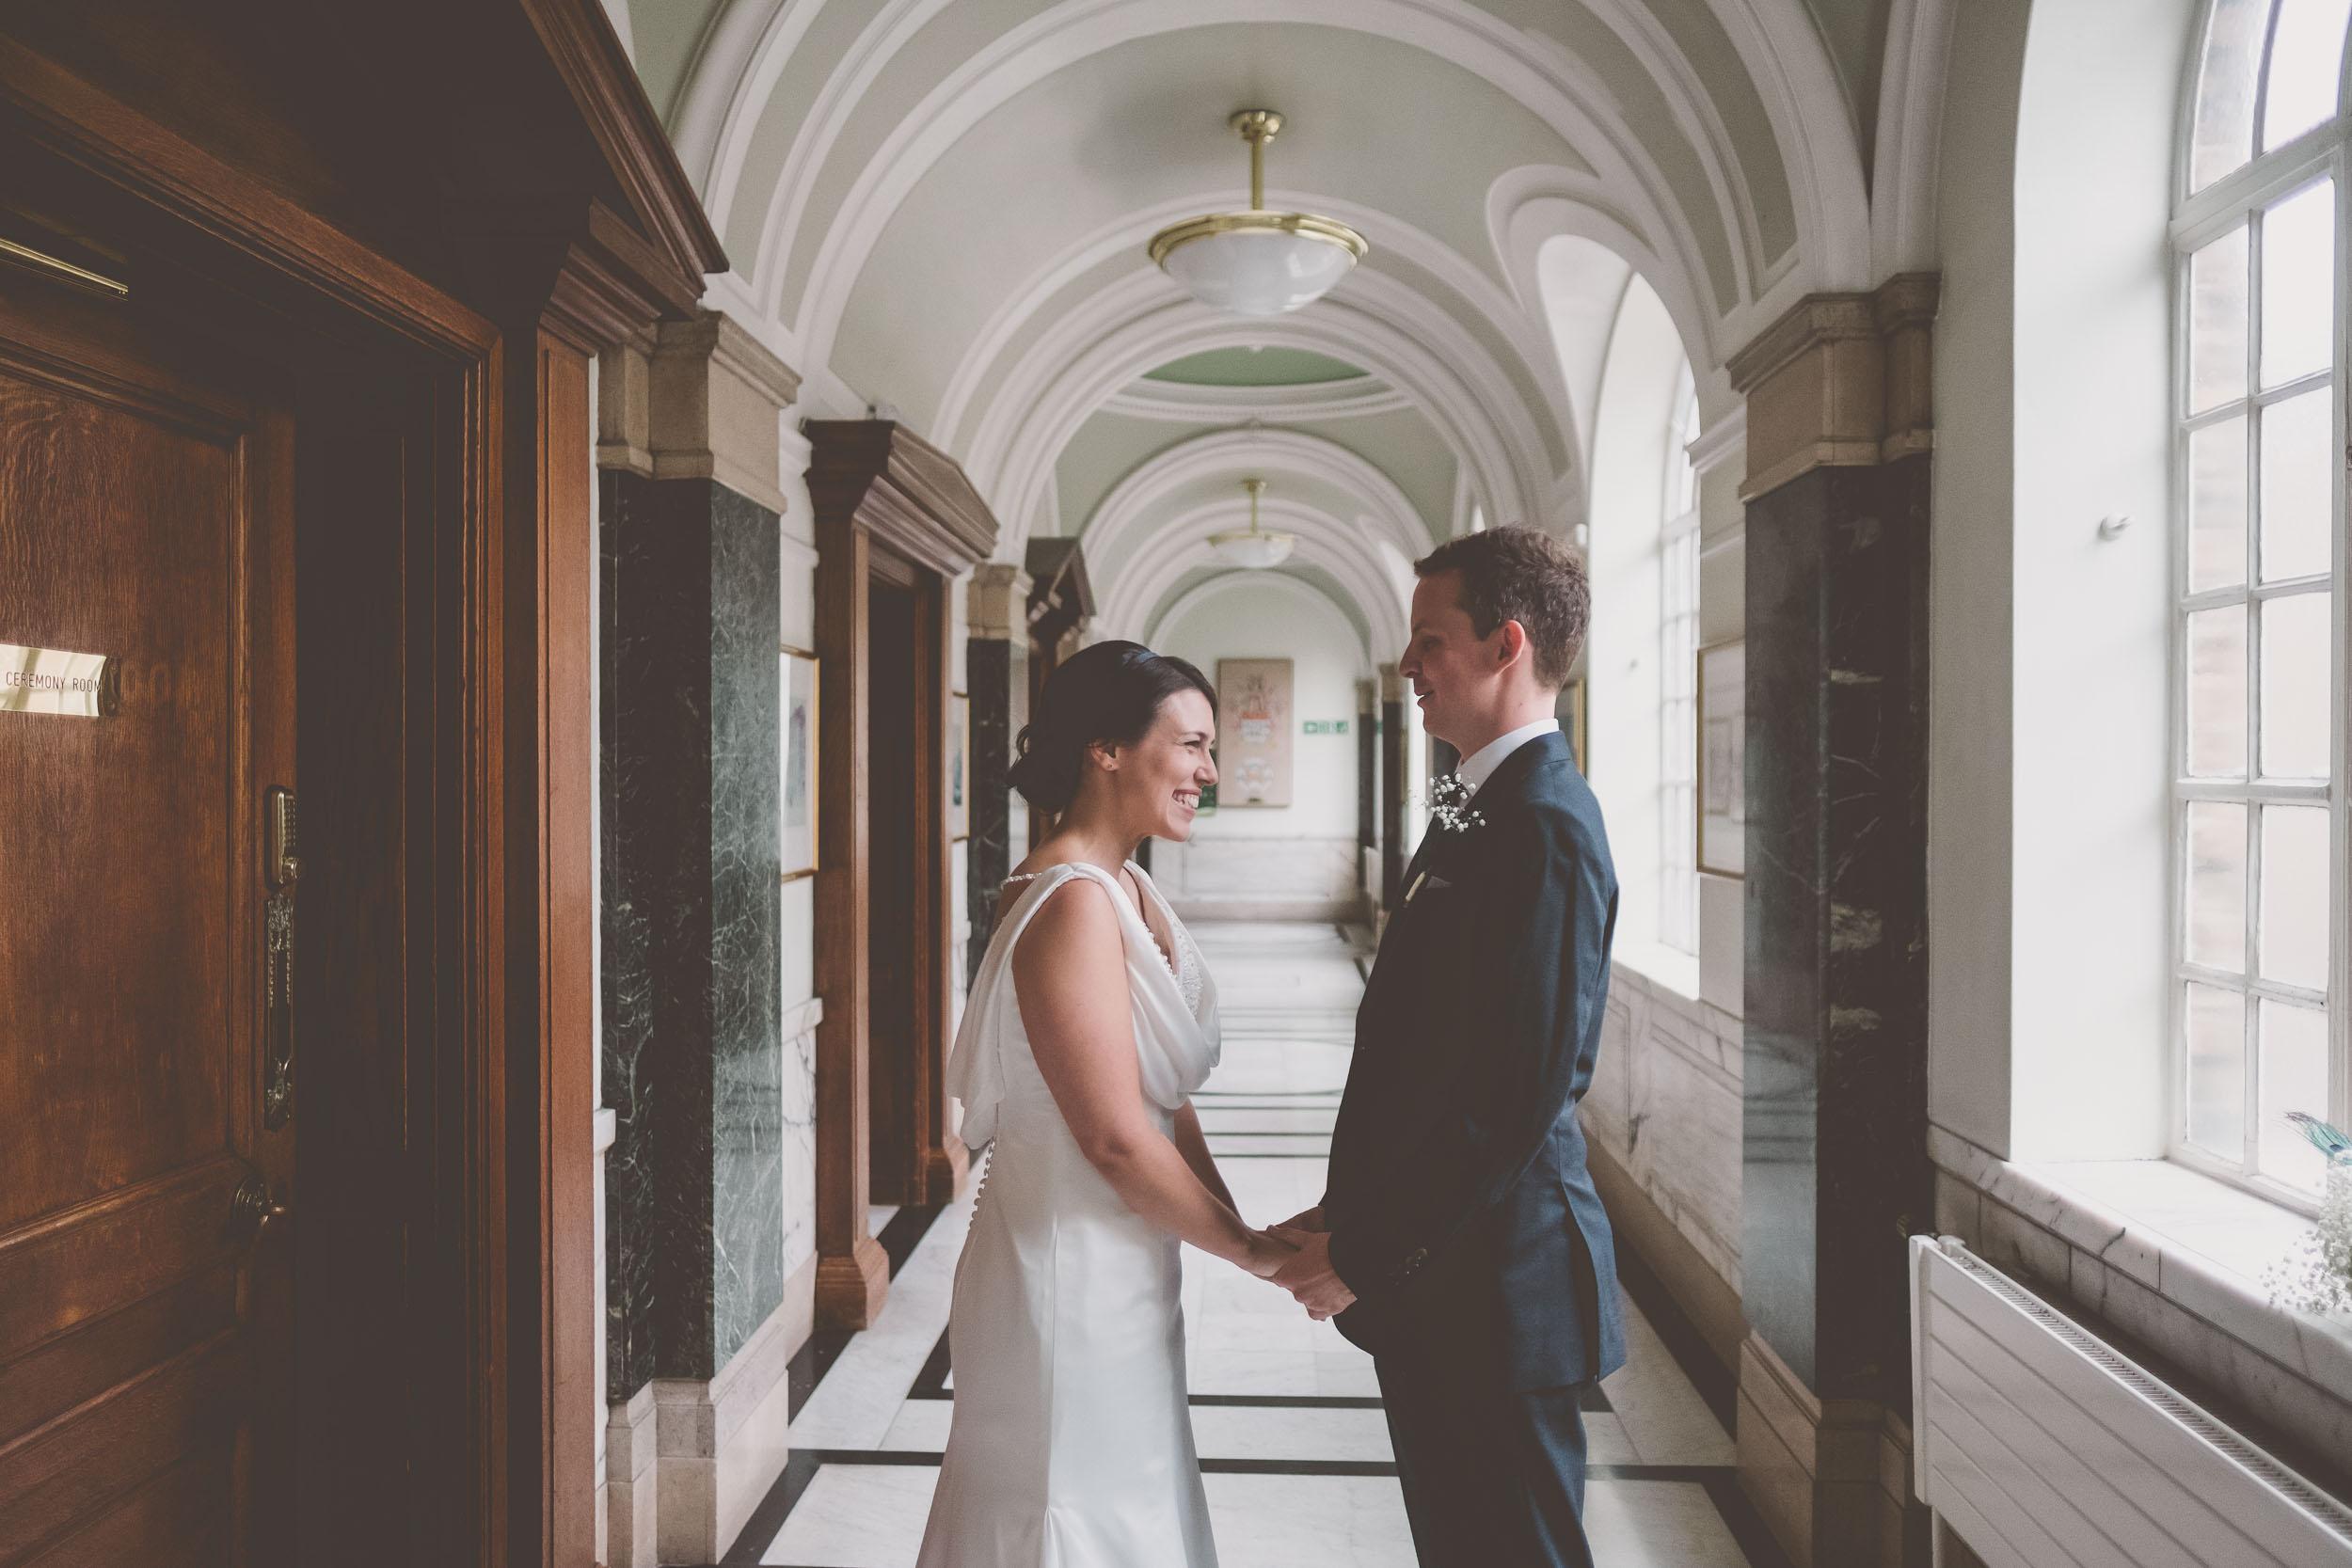 islington-town-hall-4th-floor-studios-wedding131.jpg